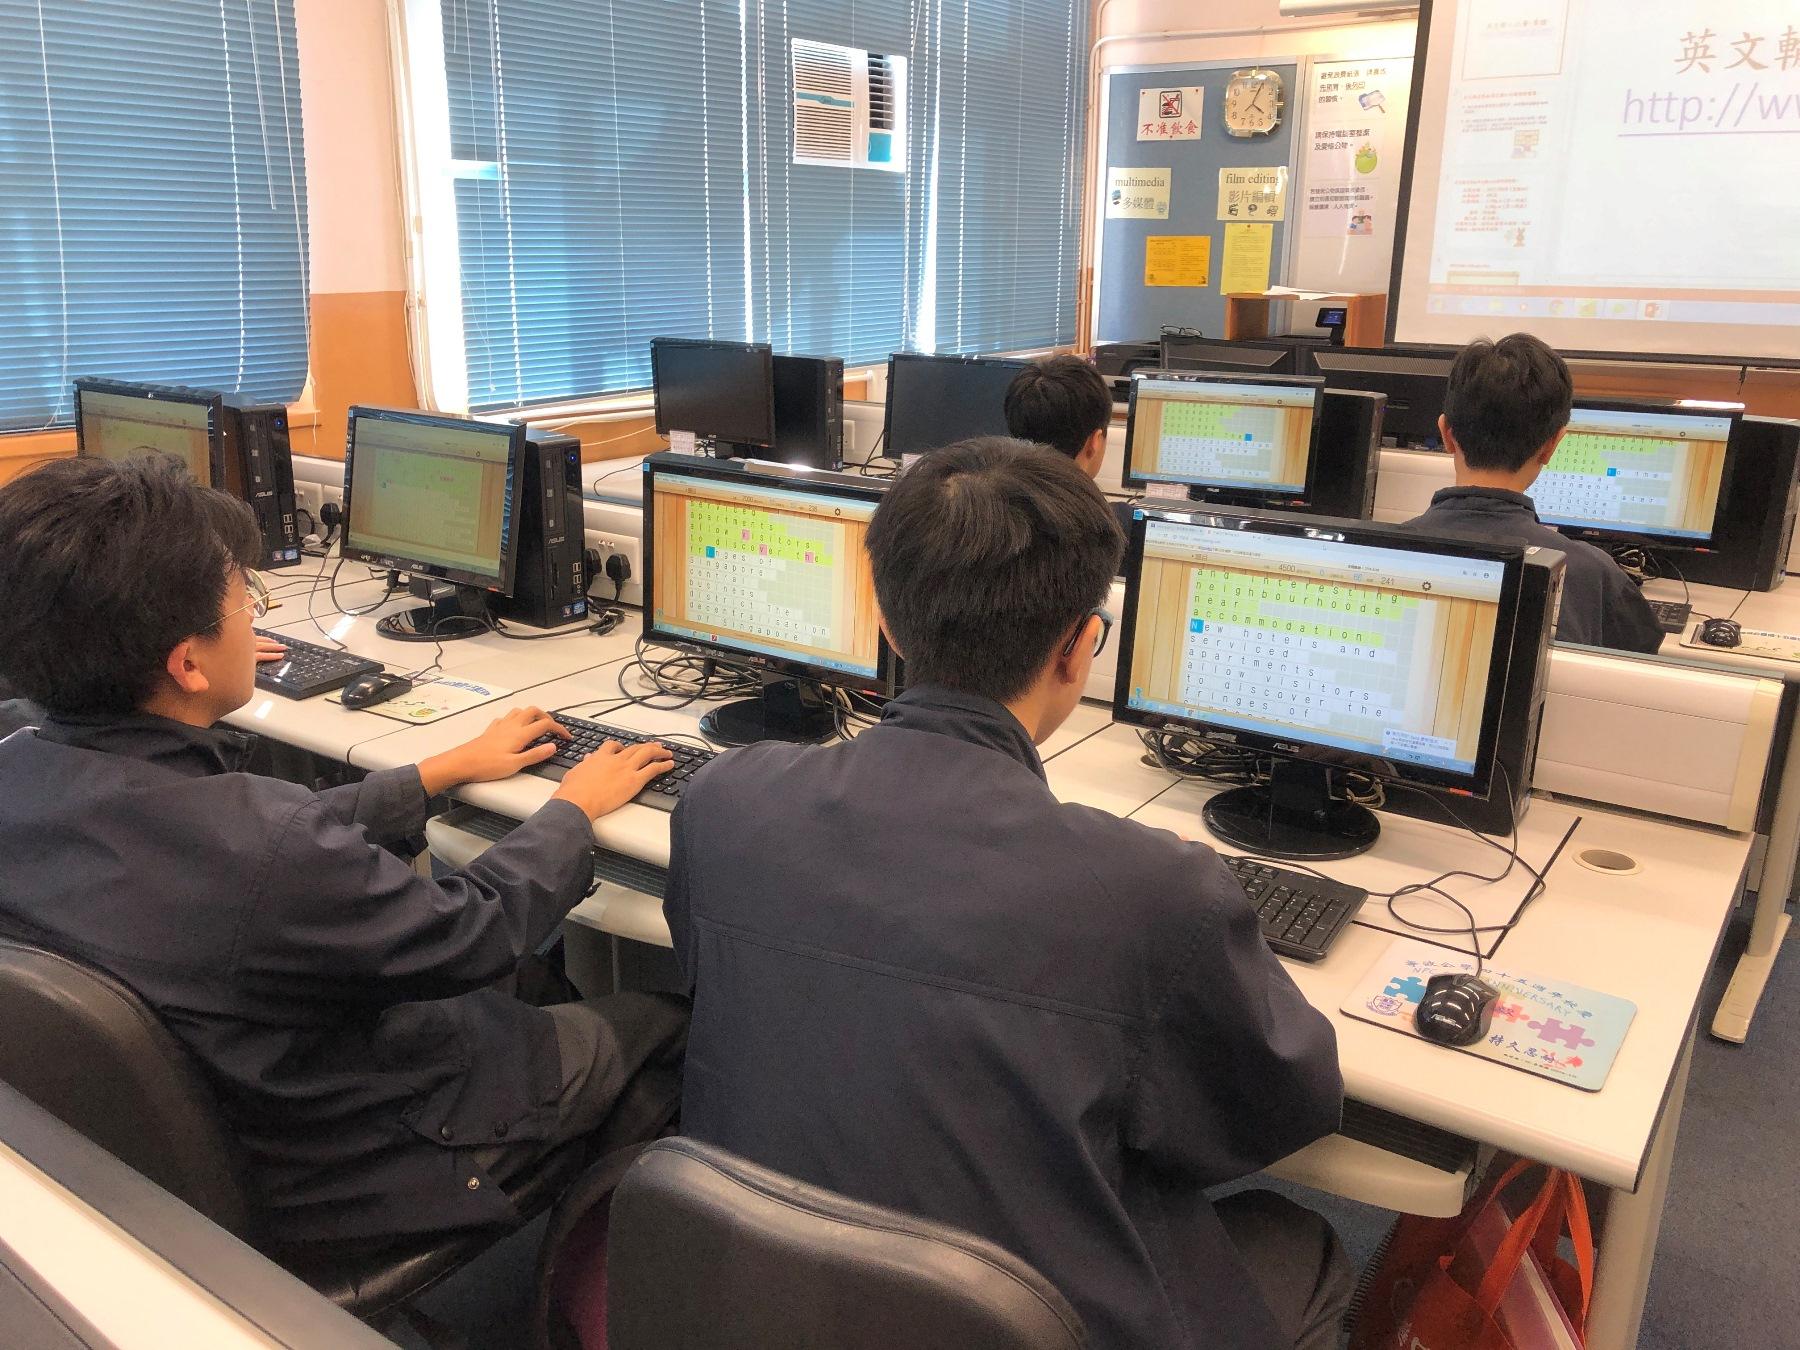 http://npc.edu.hk/sites/default/files/img_6902.jpg